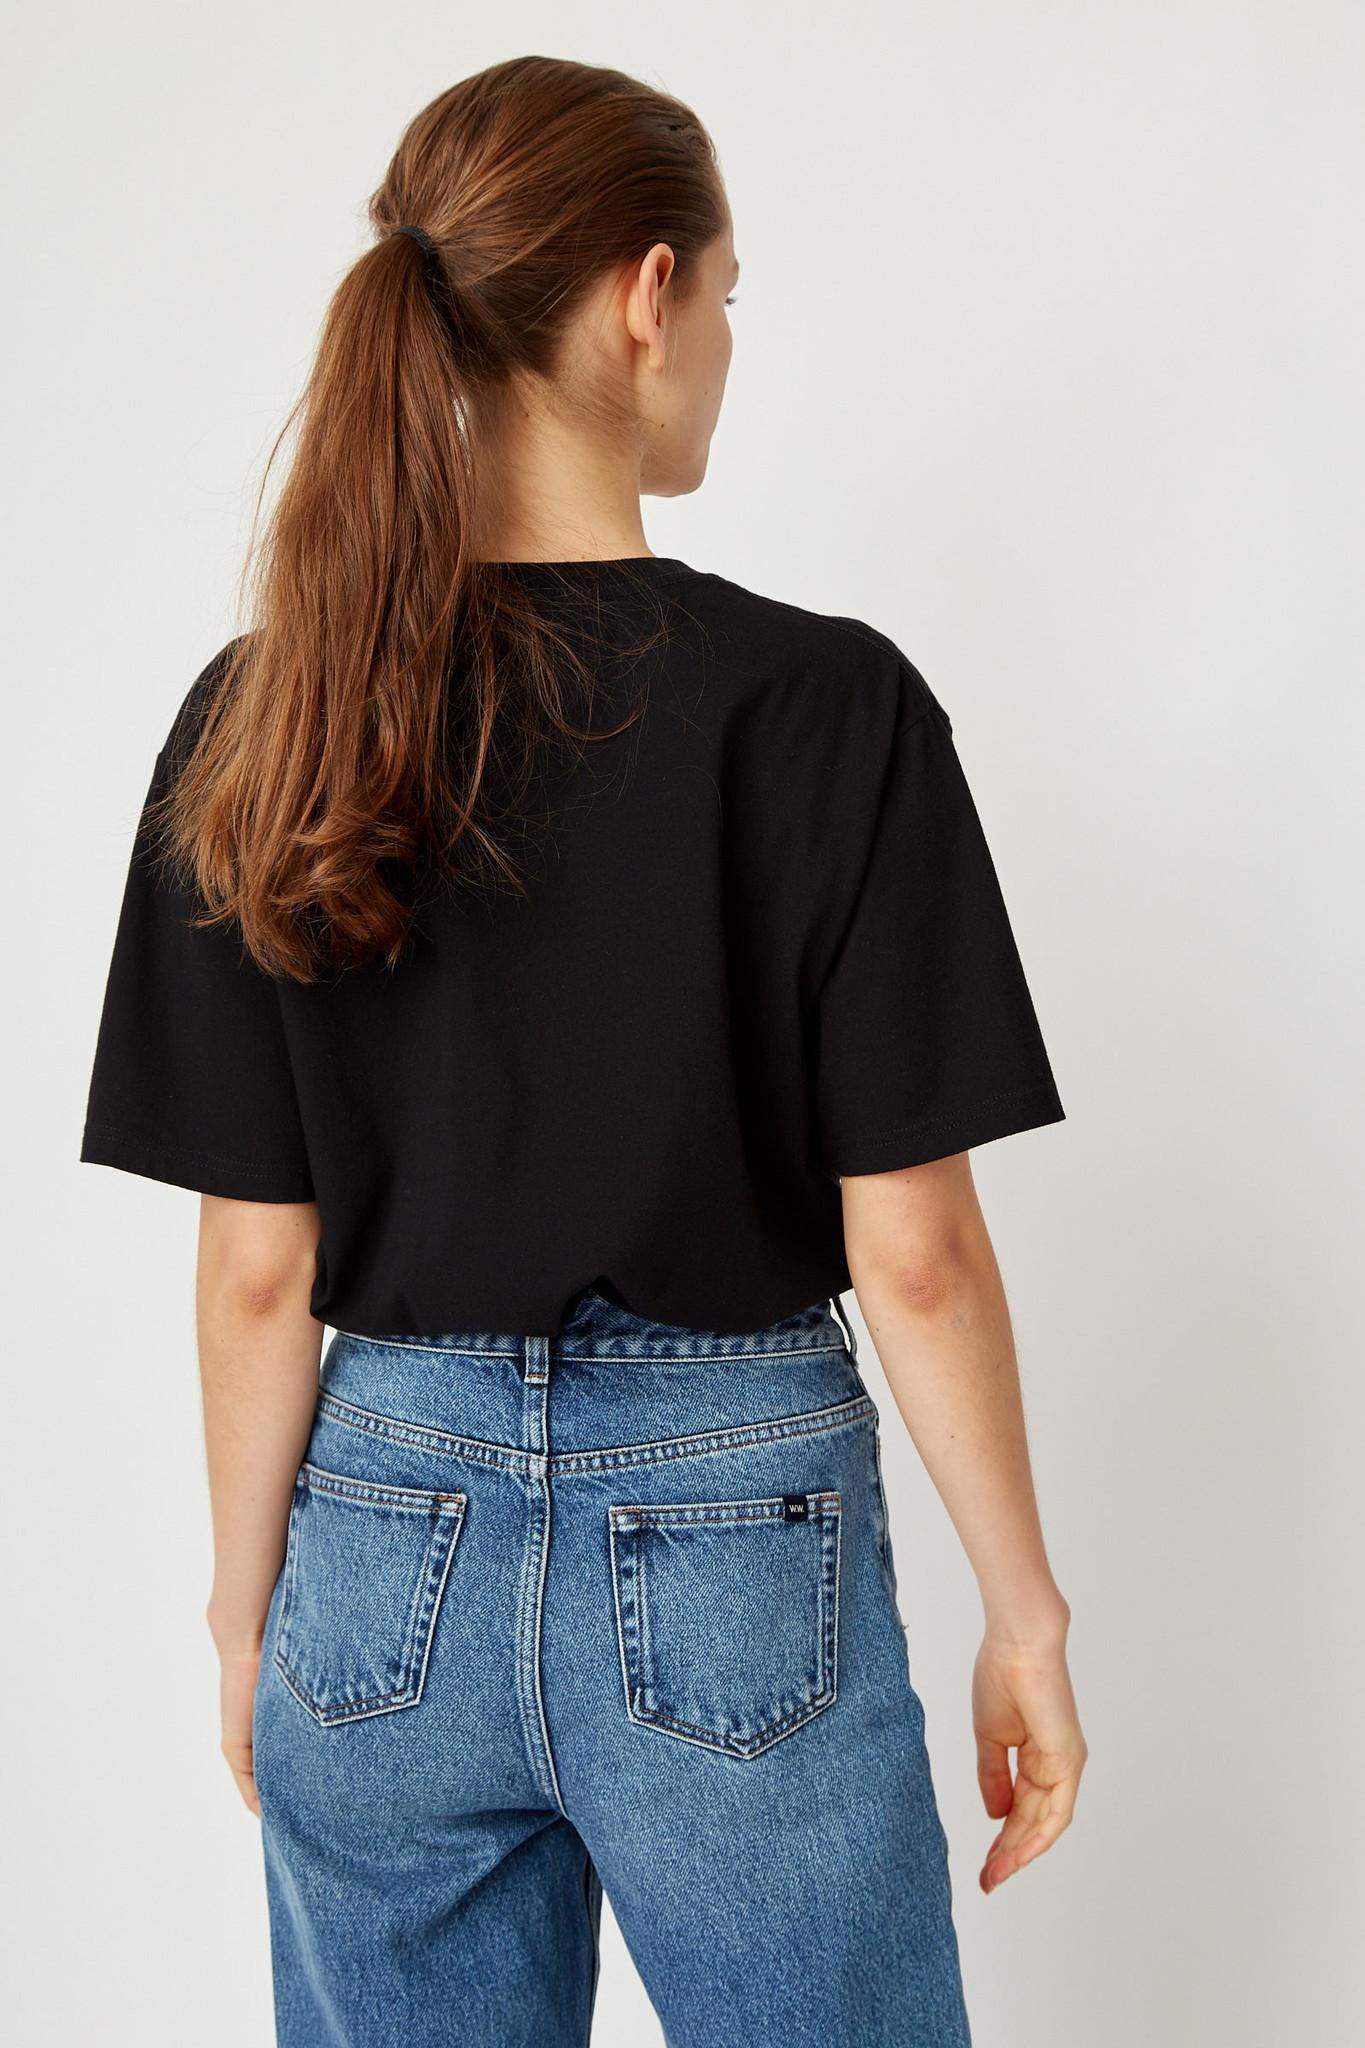 Info T-Shirt Black Unisex-8